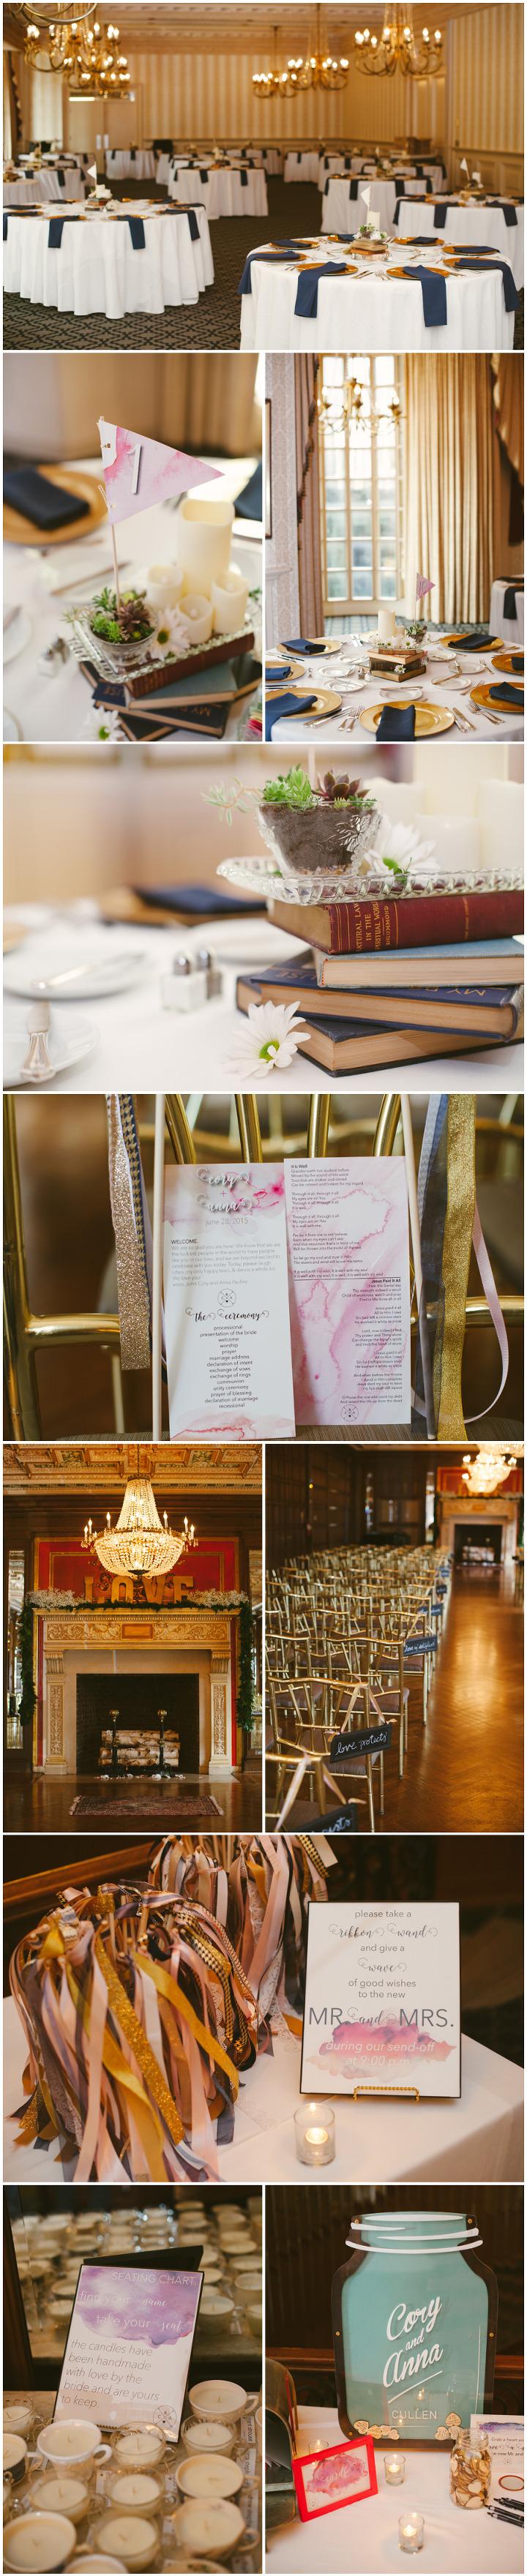 Blog Collage-Anna+Cory12